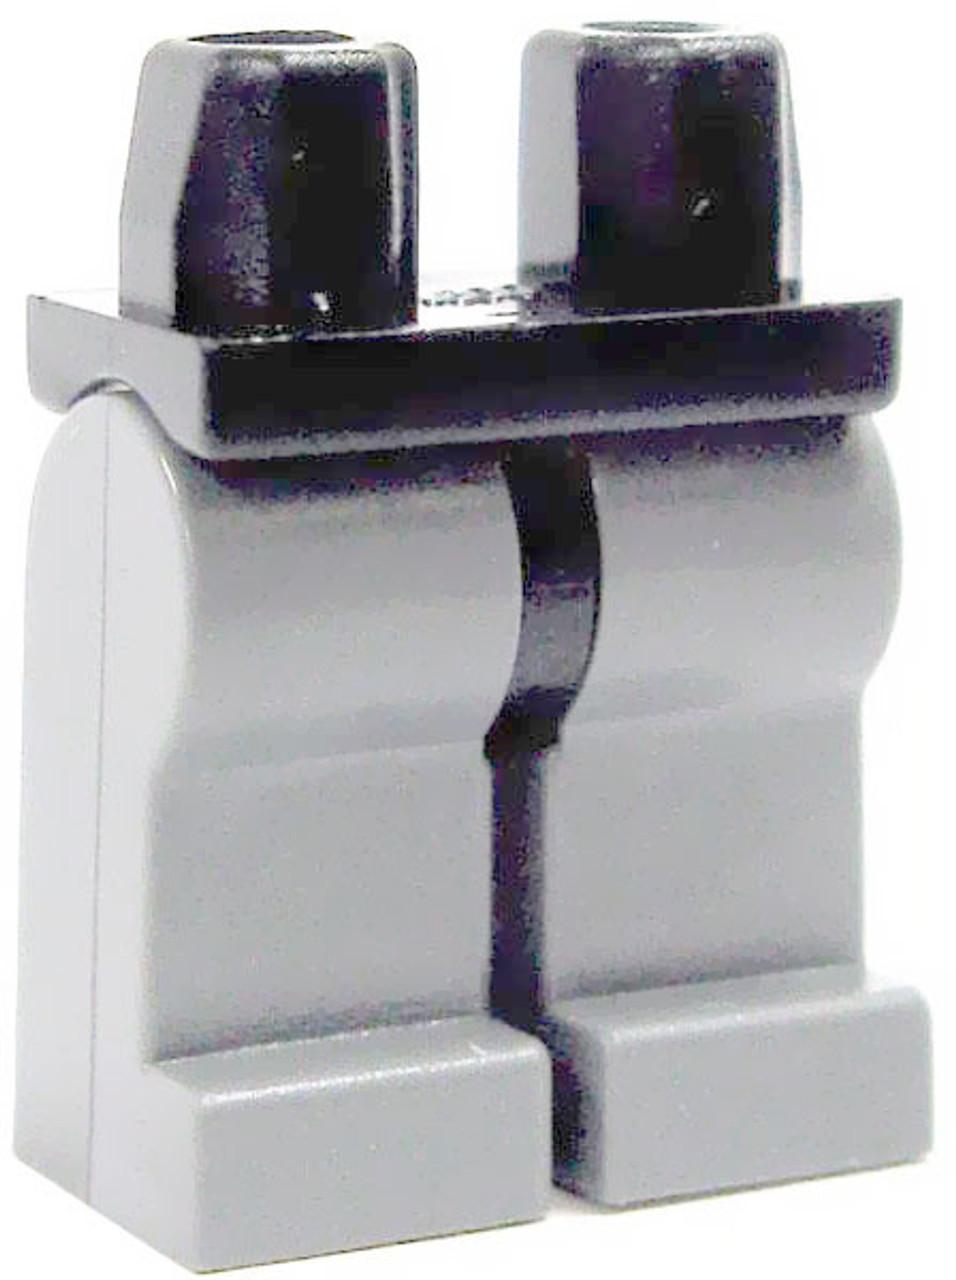 LEGO Black with Light Gray Legs Loose Legs #4492335 [Loose]